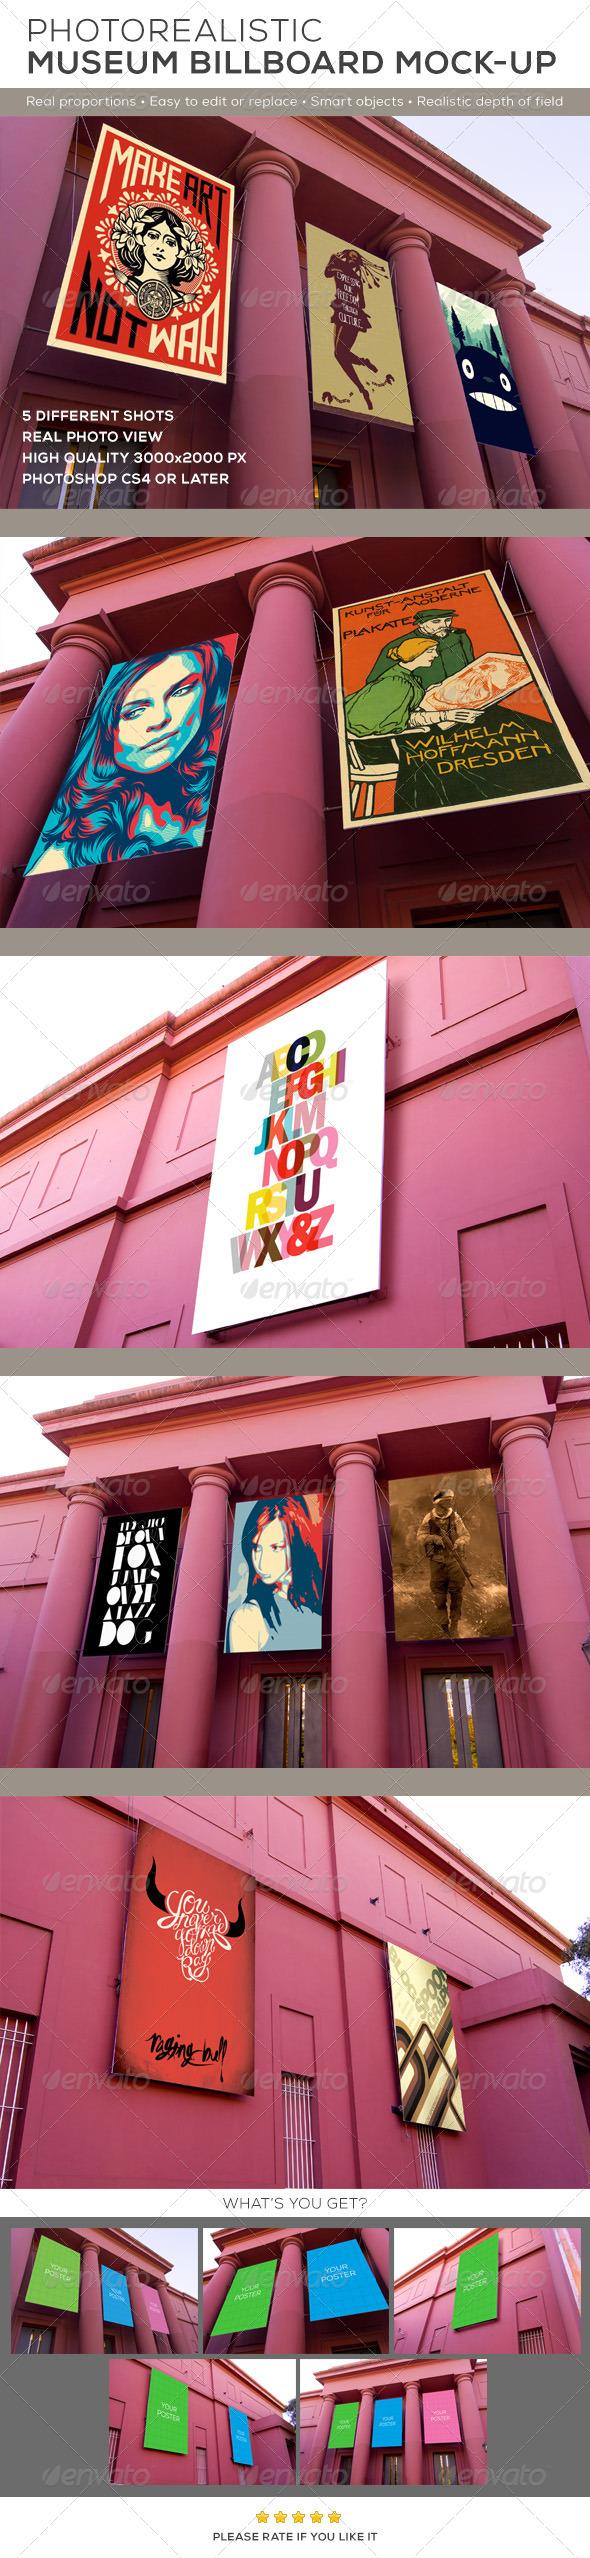 GraphicRiver Museum Billboard Exhibition Mock-Ups 8766696